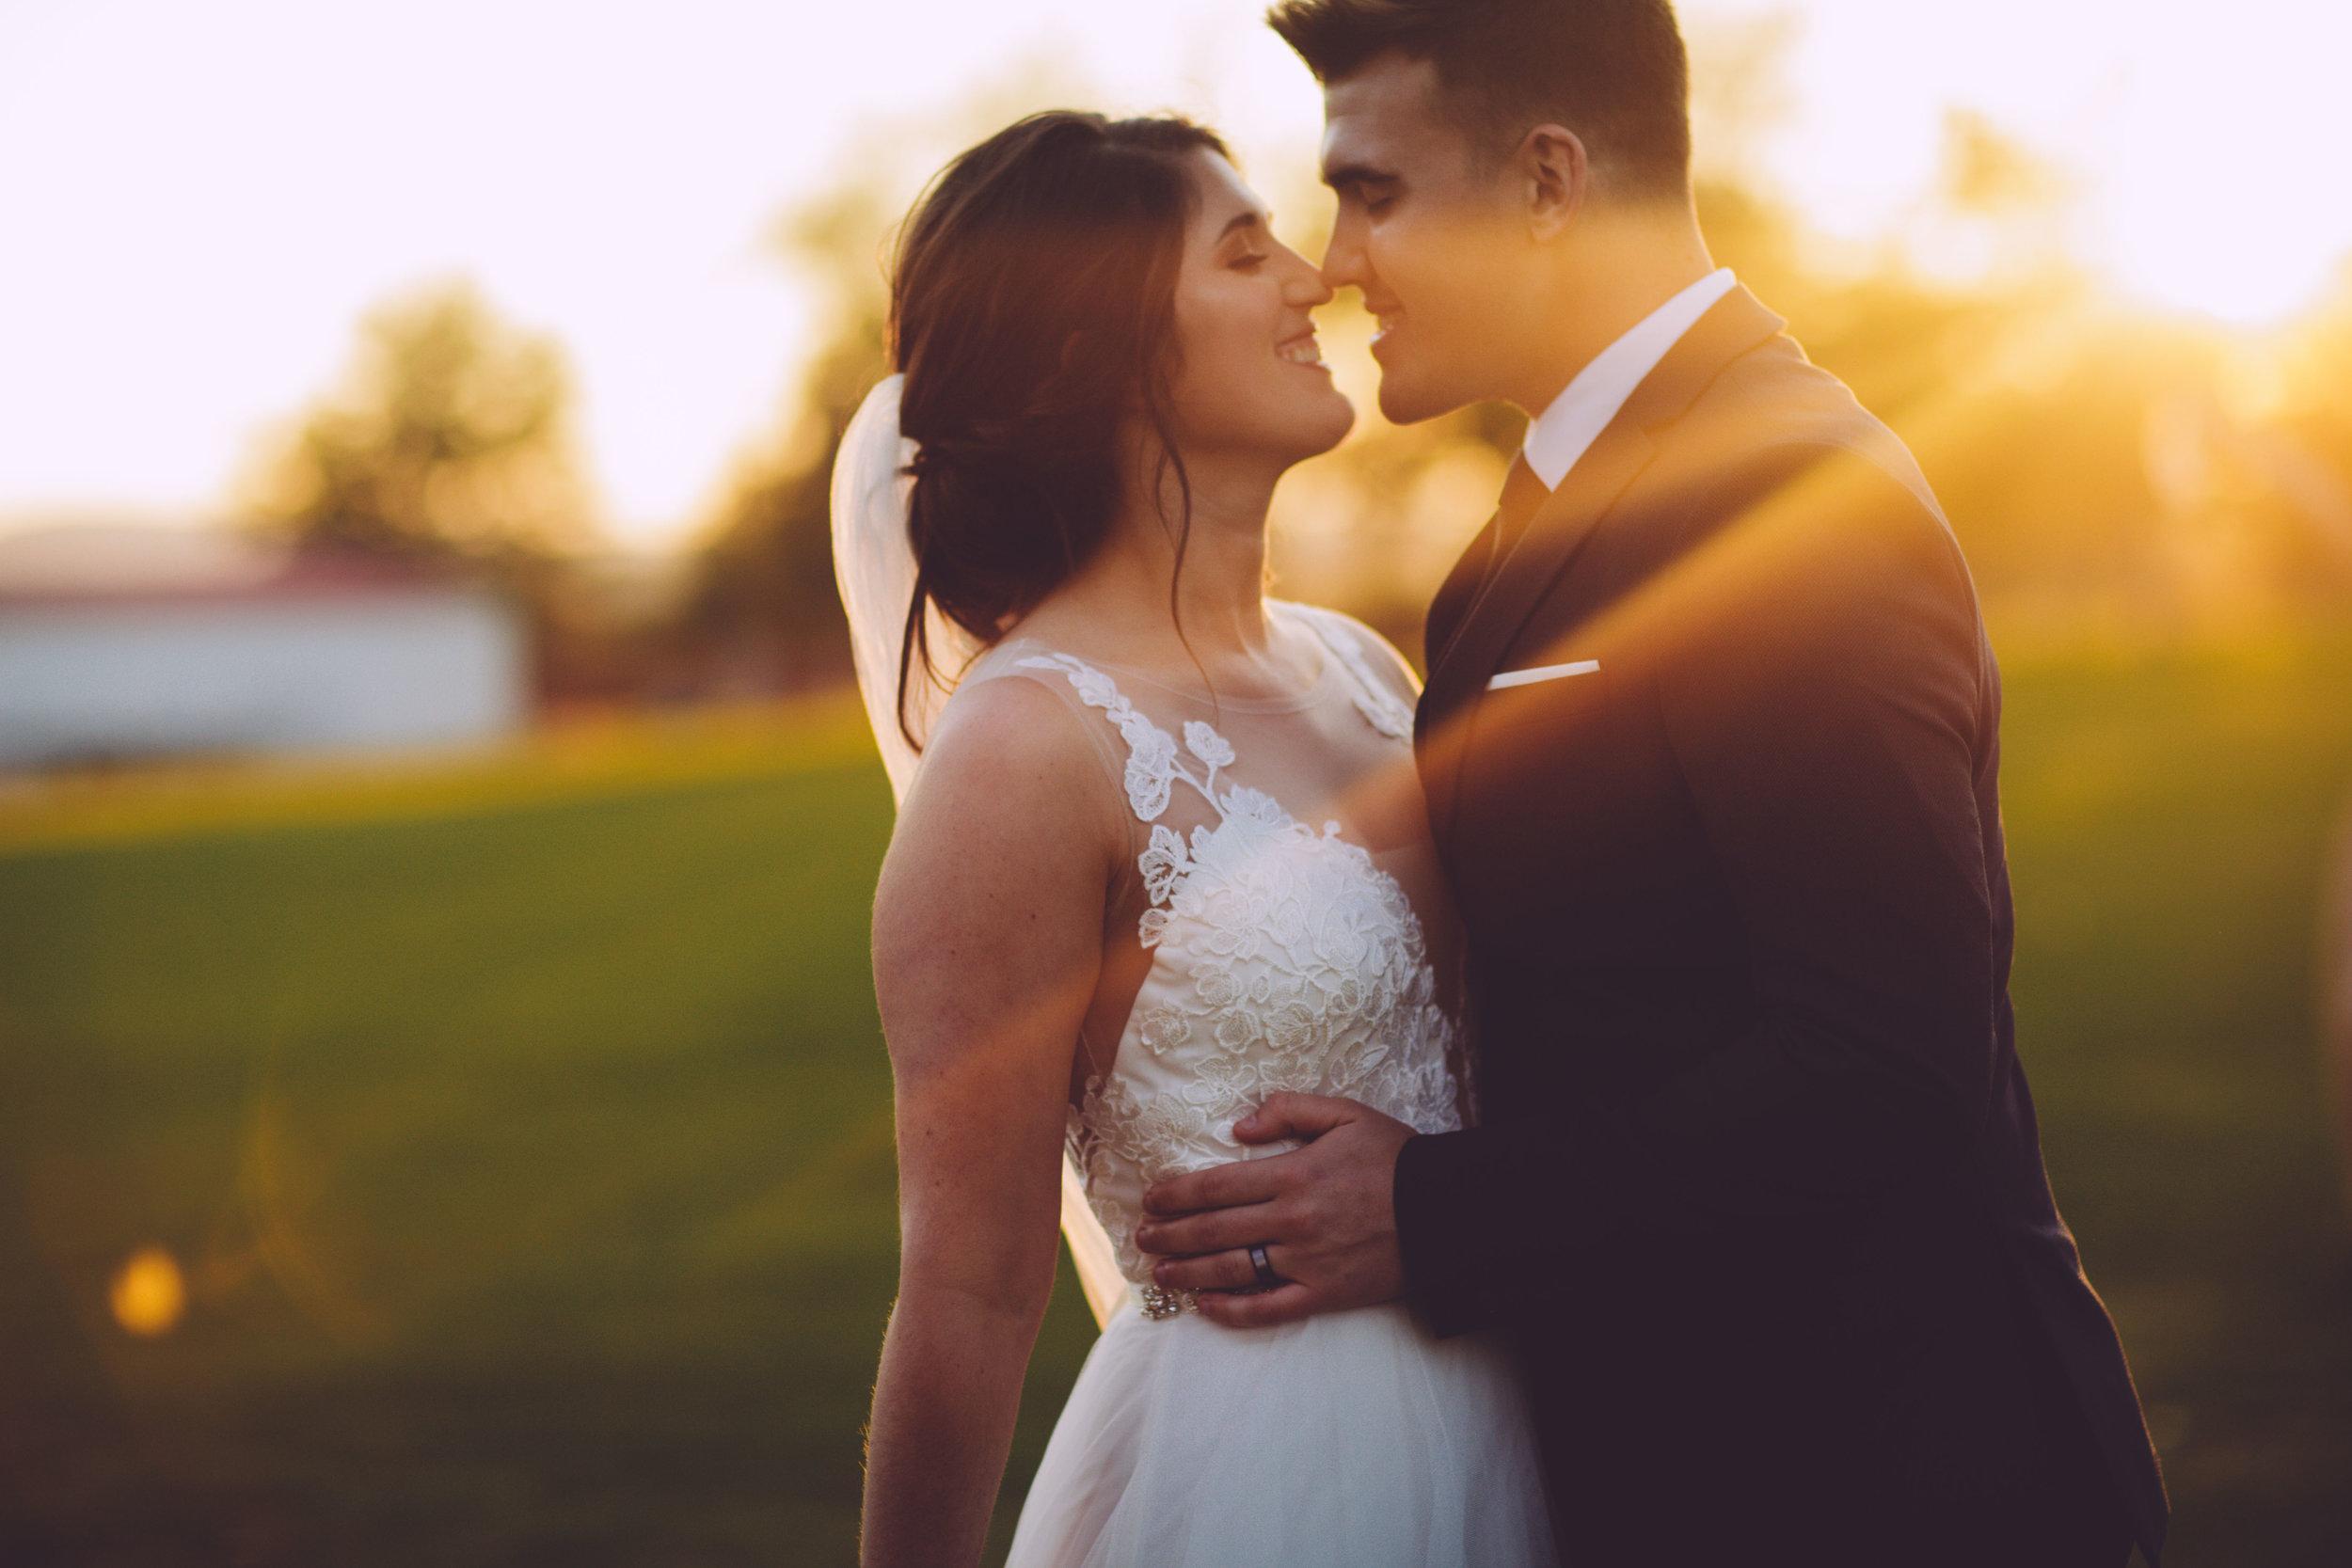 real bride and groom wedding tri cities Richland spokane wa